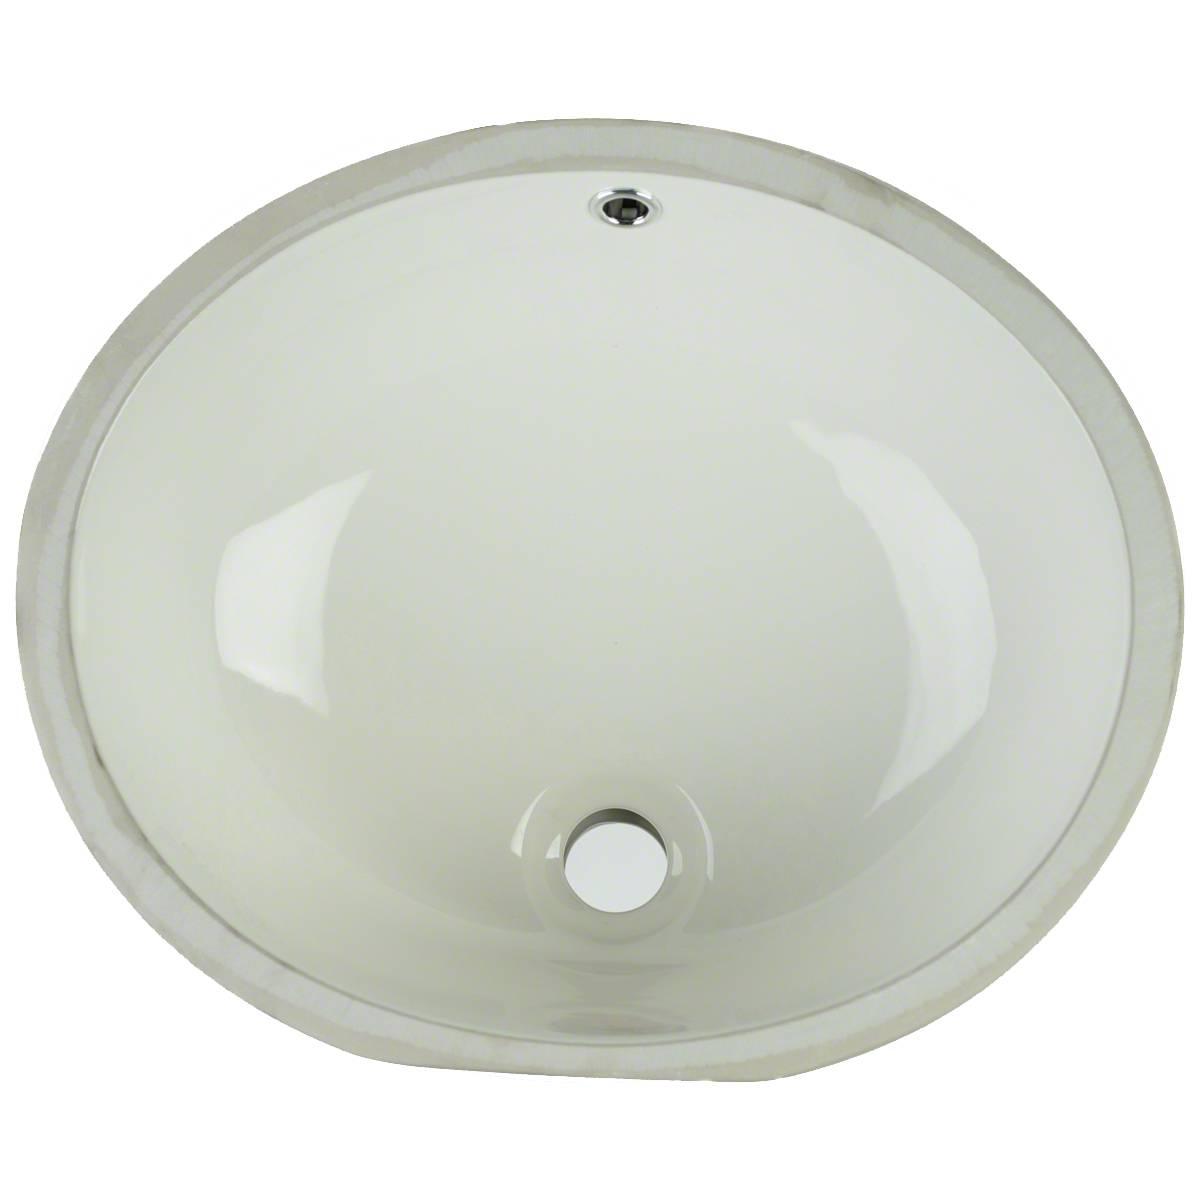 Sinks -porcelain-vanity-bisque-oval-1714-SIN-POR-UNDOVLBISQ-1714